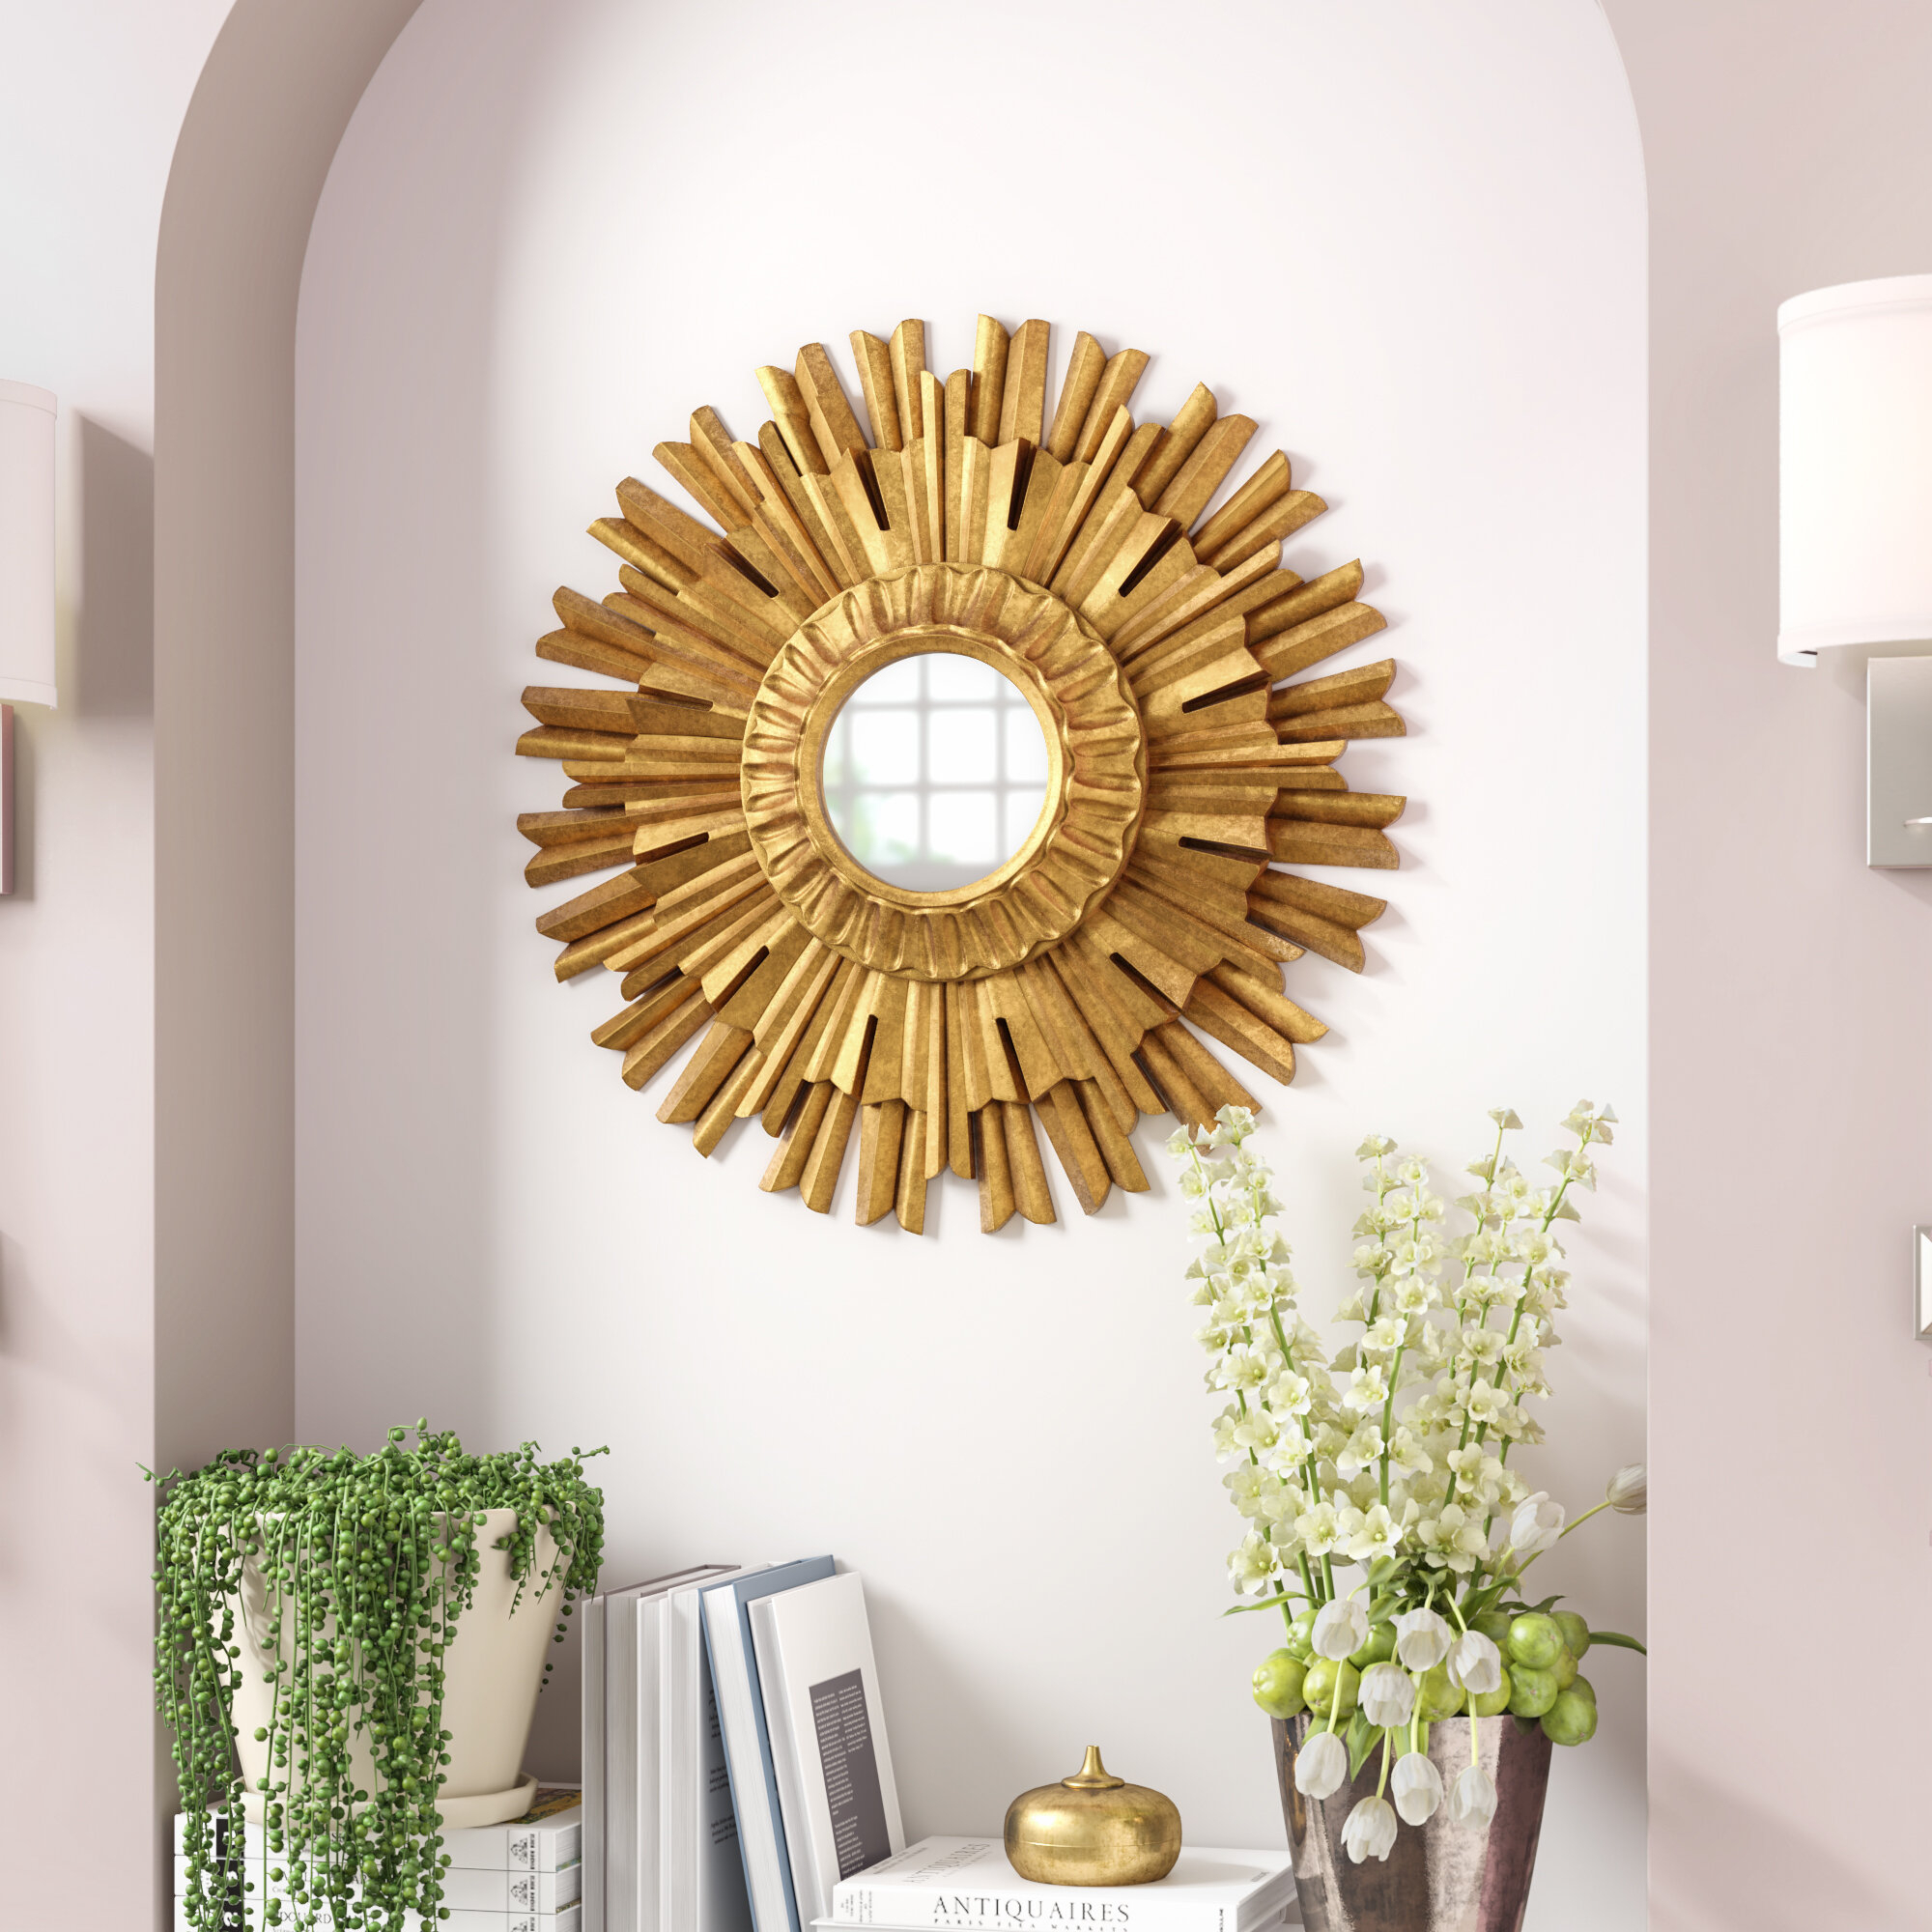 Durkee Circular Wall Mirror Regarding Starburst Wall Decor By Willa Arlo Interiors (Photo 14 of 30)